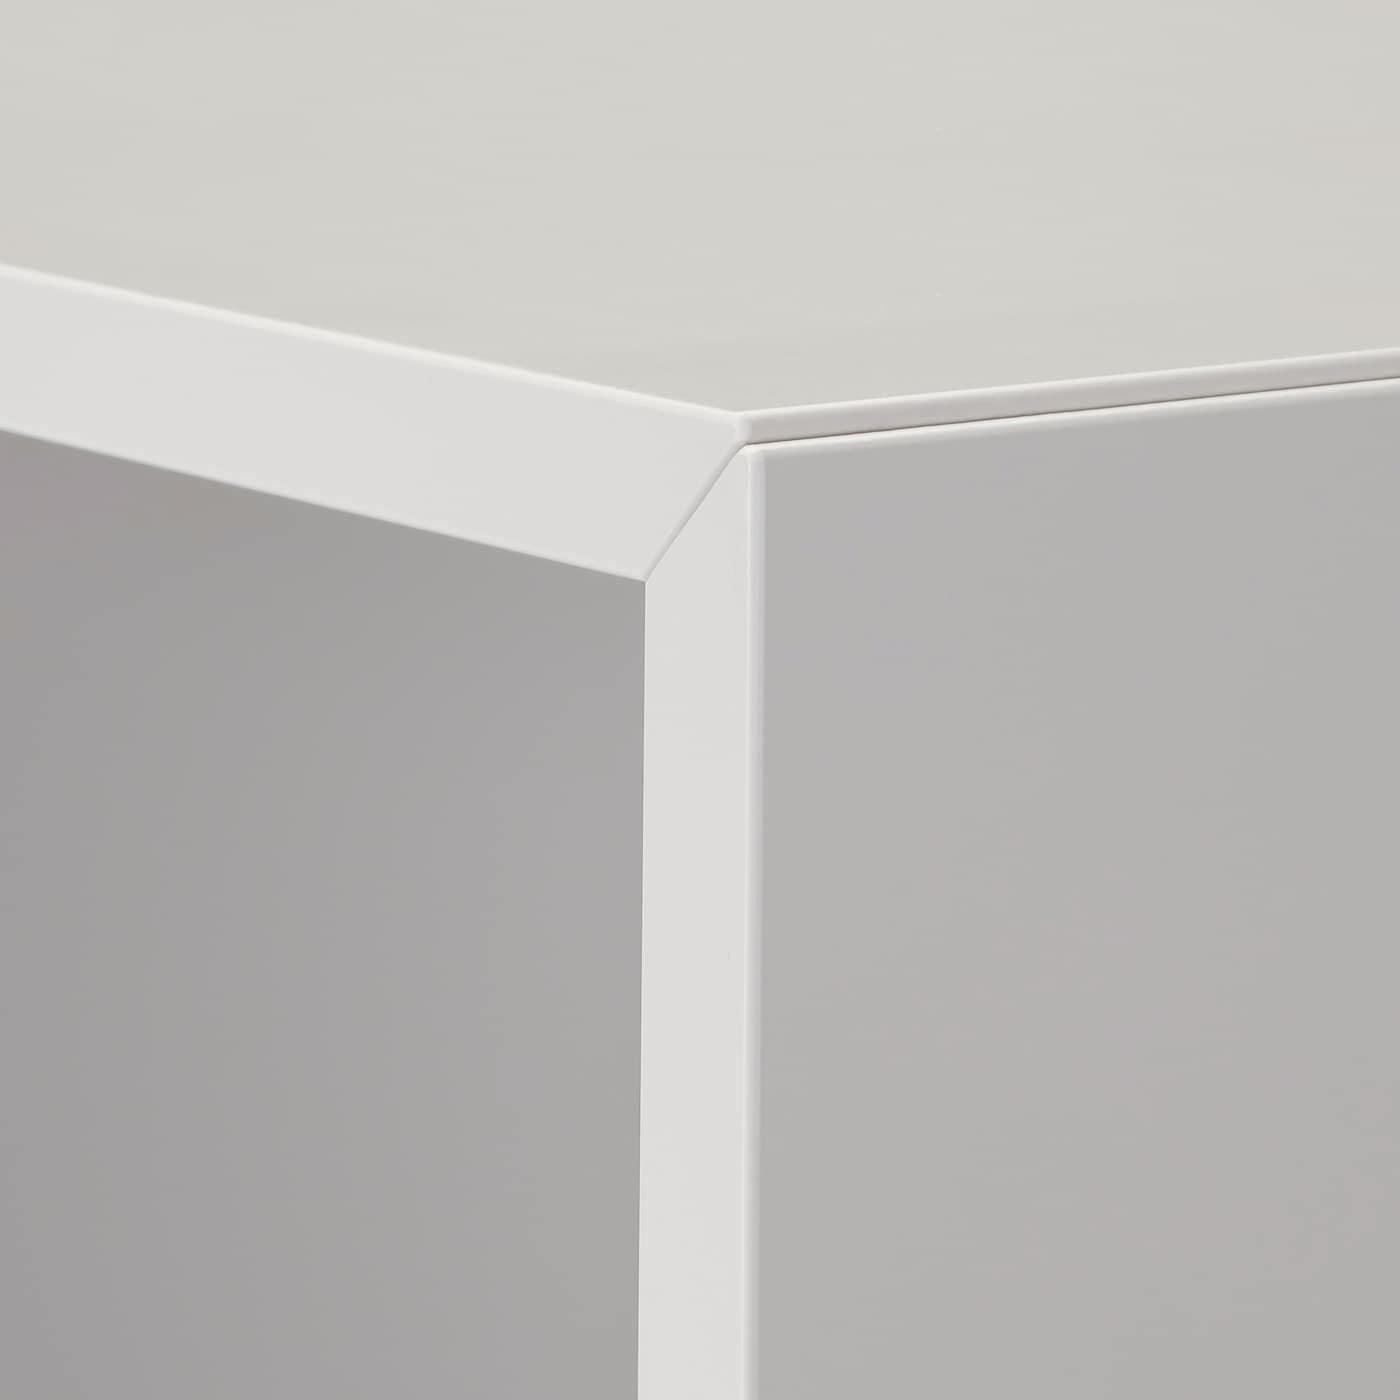 "EKET cabinet light gray 13 3/4 "" 13 3/4 "" 13 3/4 "" 15 lb"